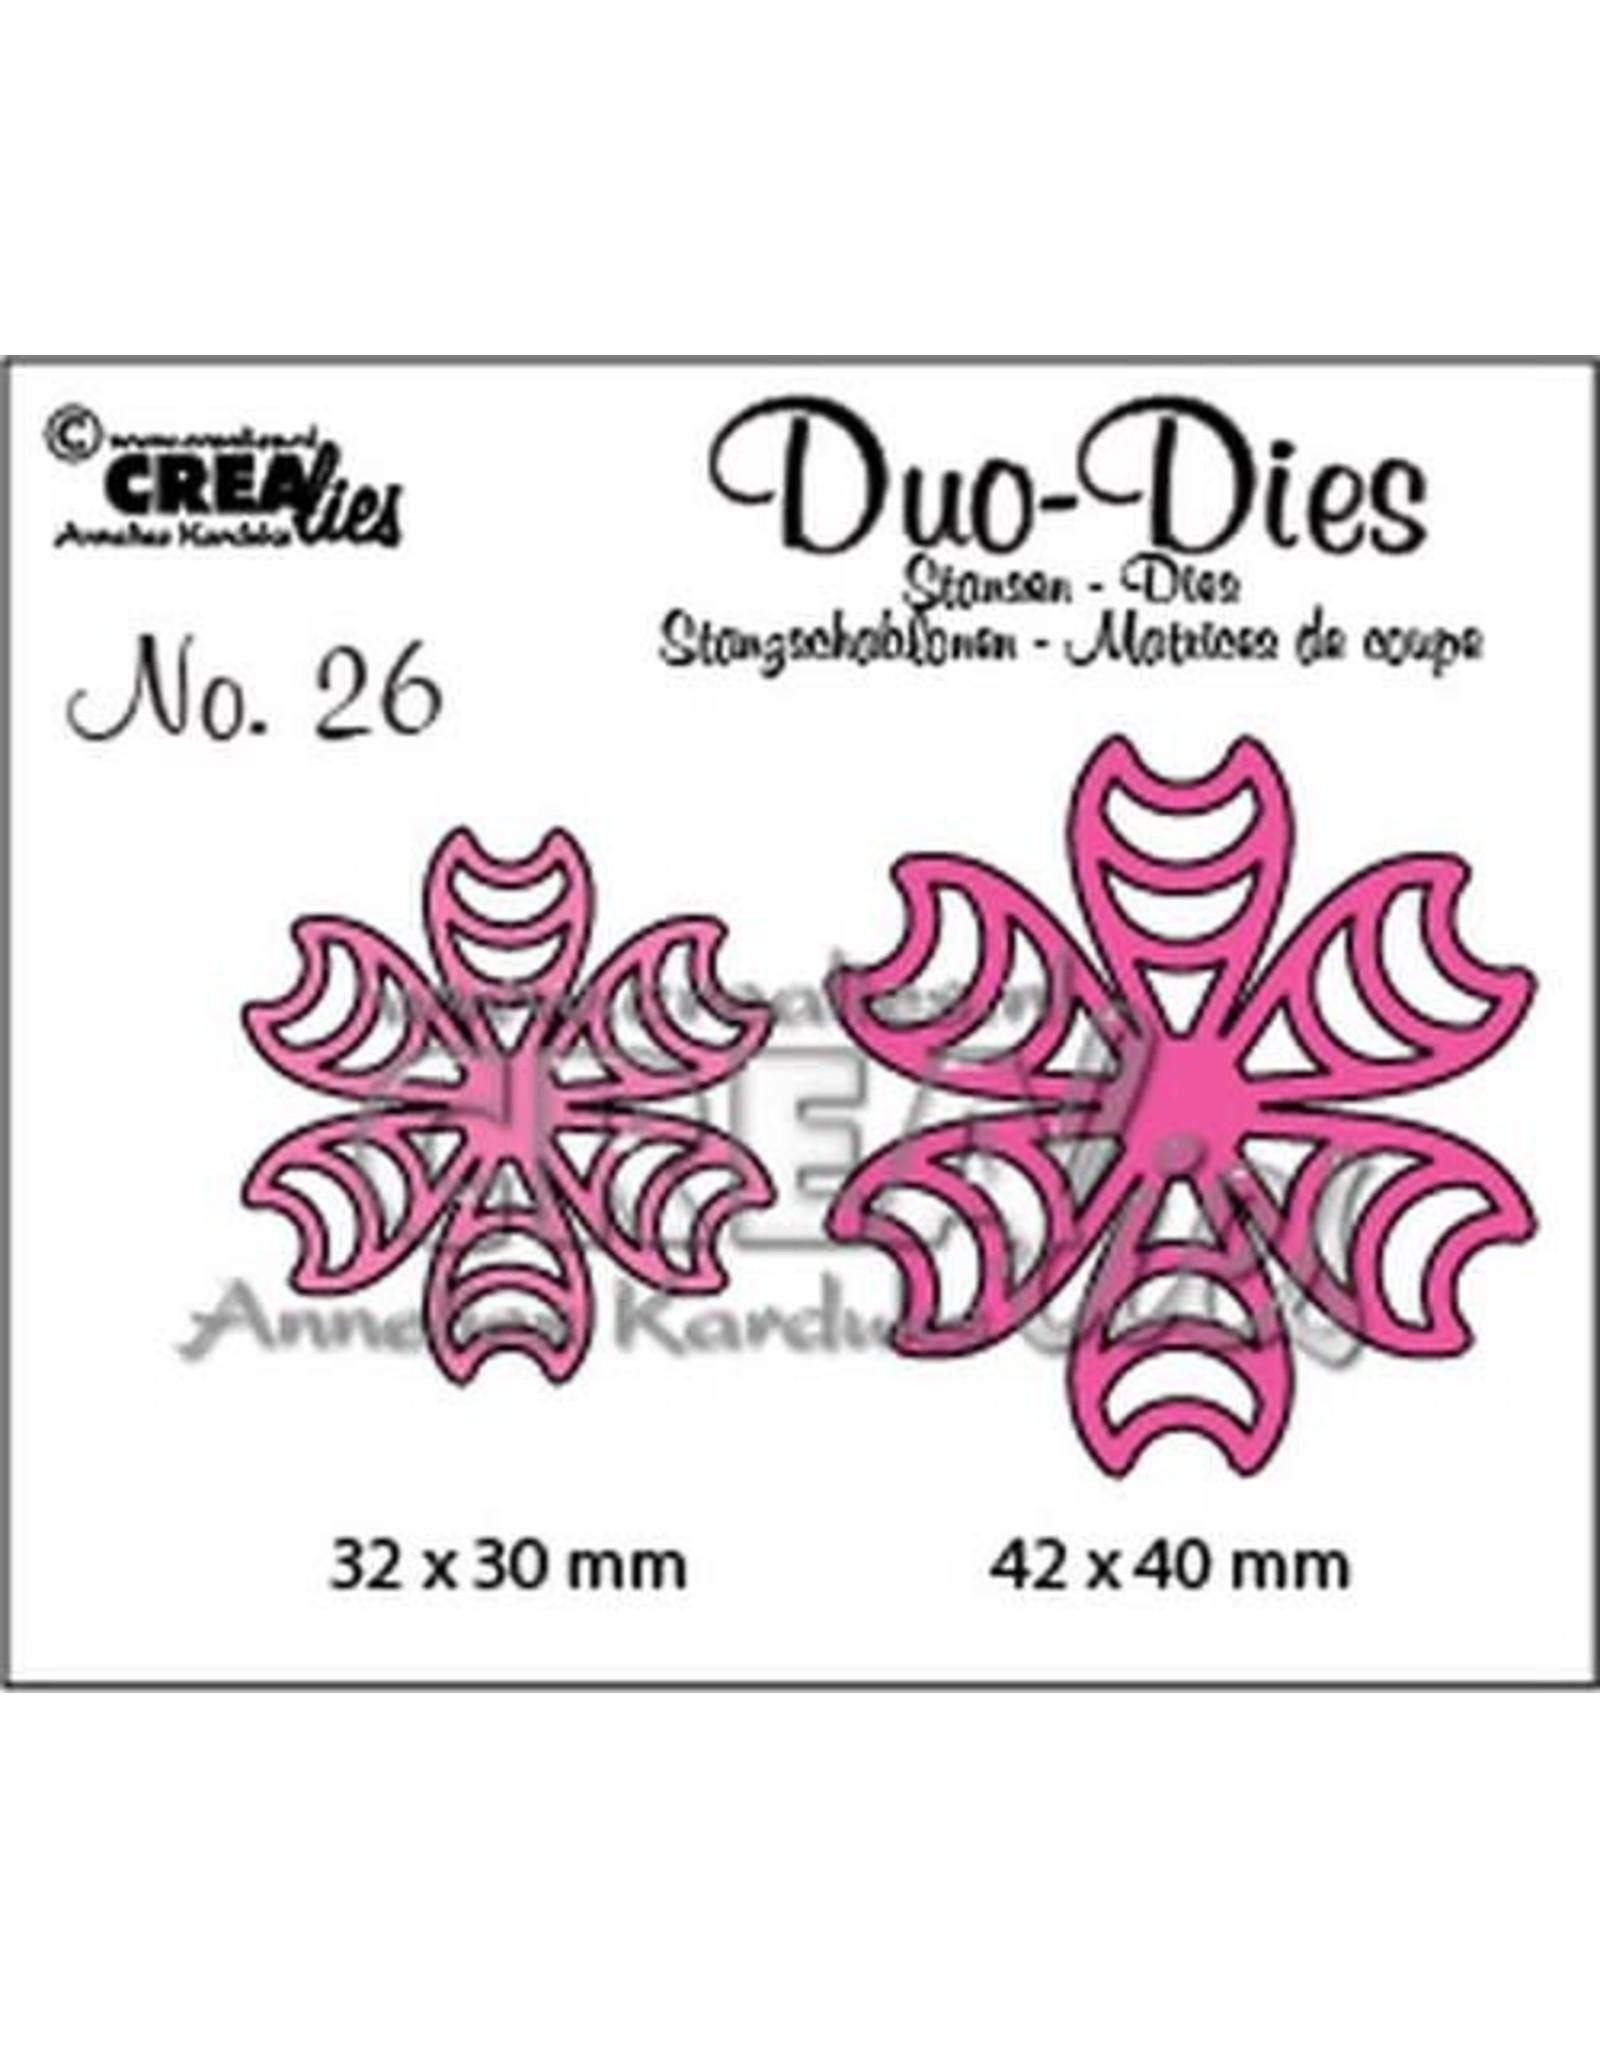 Crealies Crealies Duo Die no. 26 Flowers 16